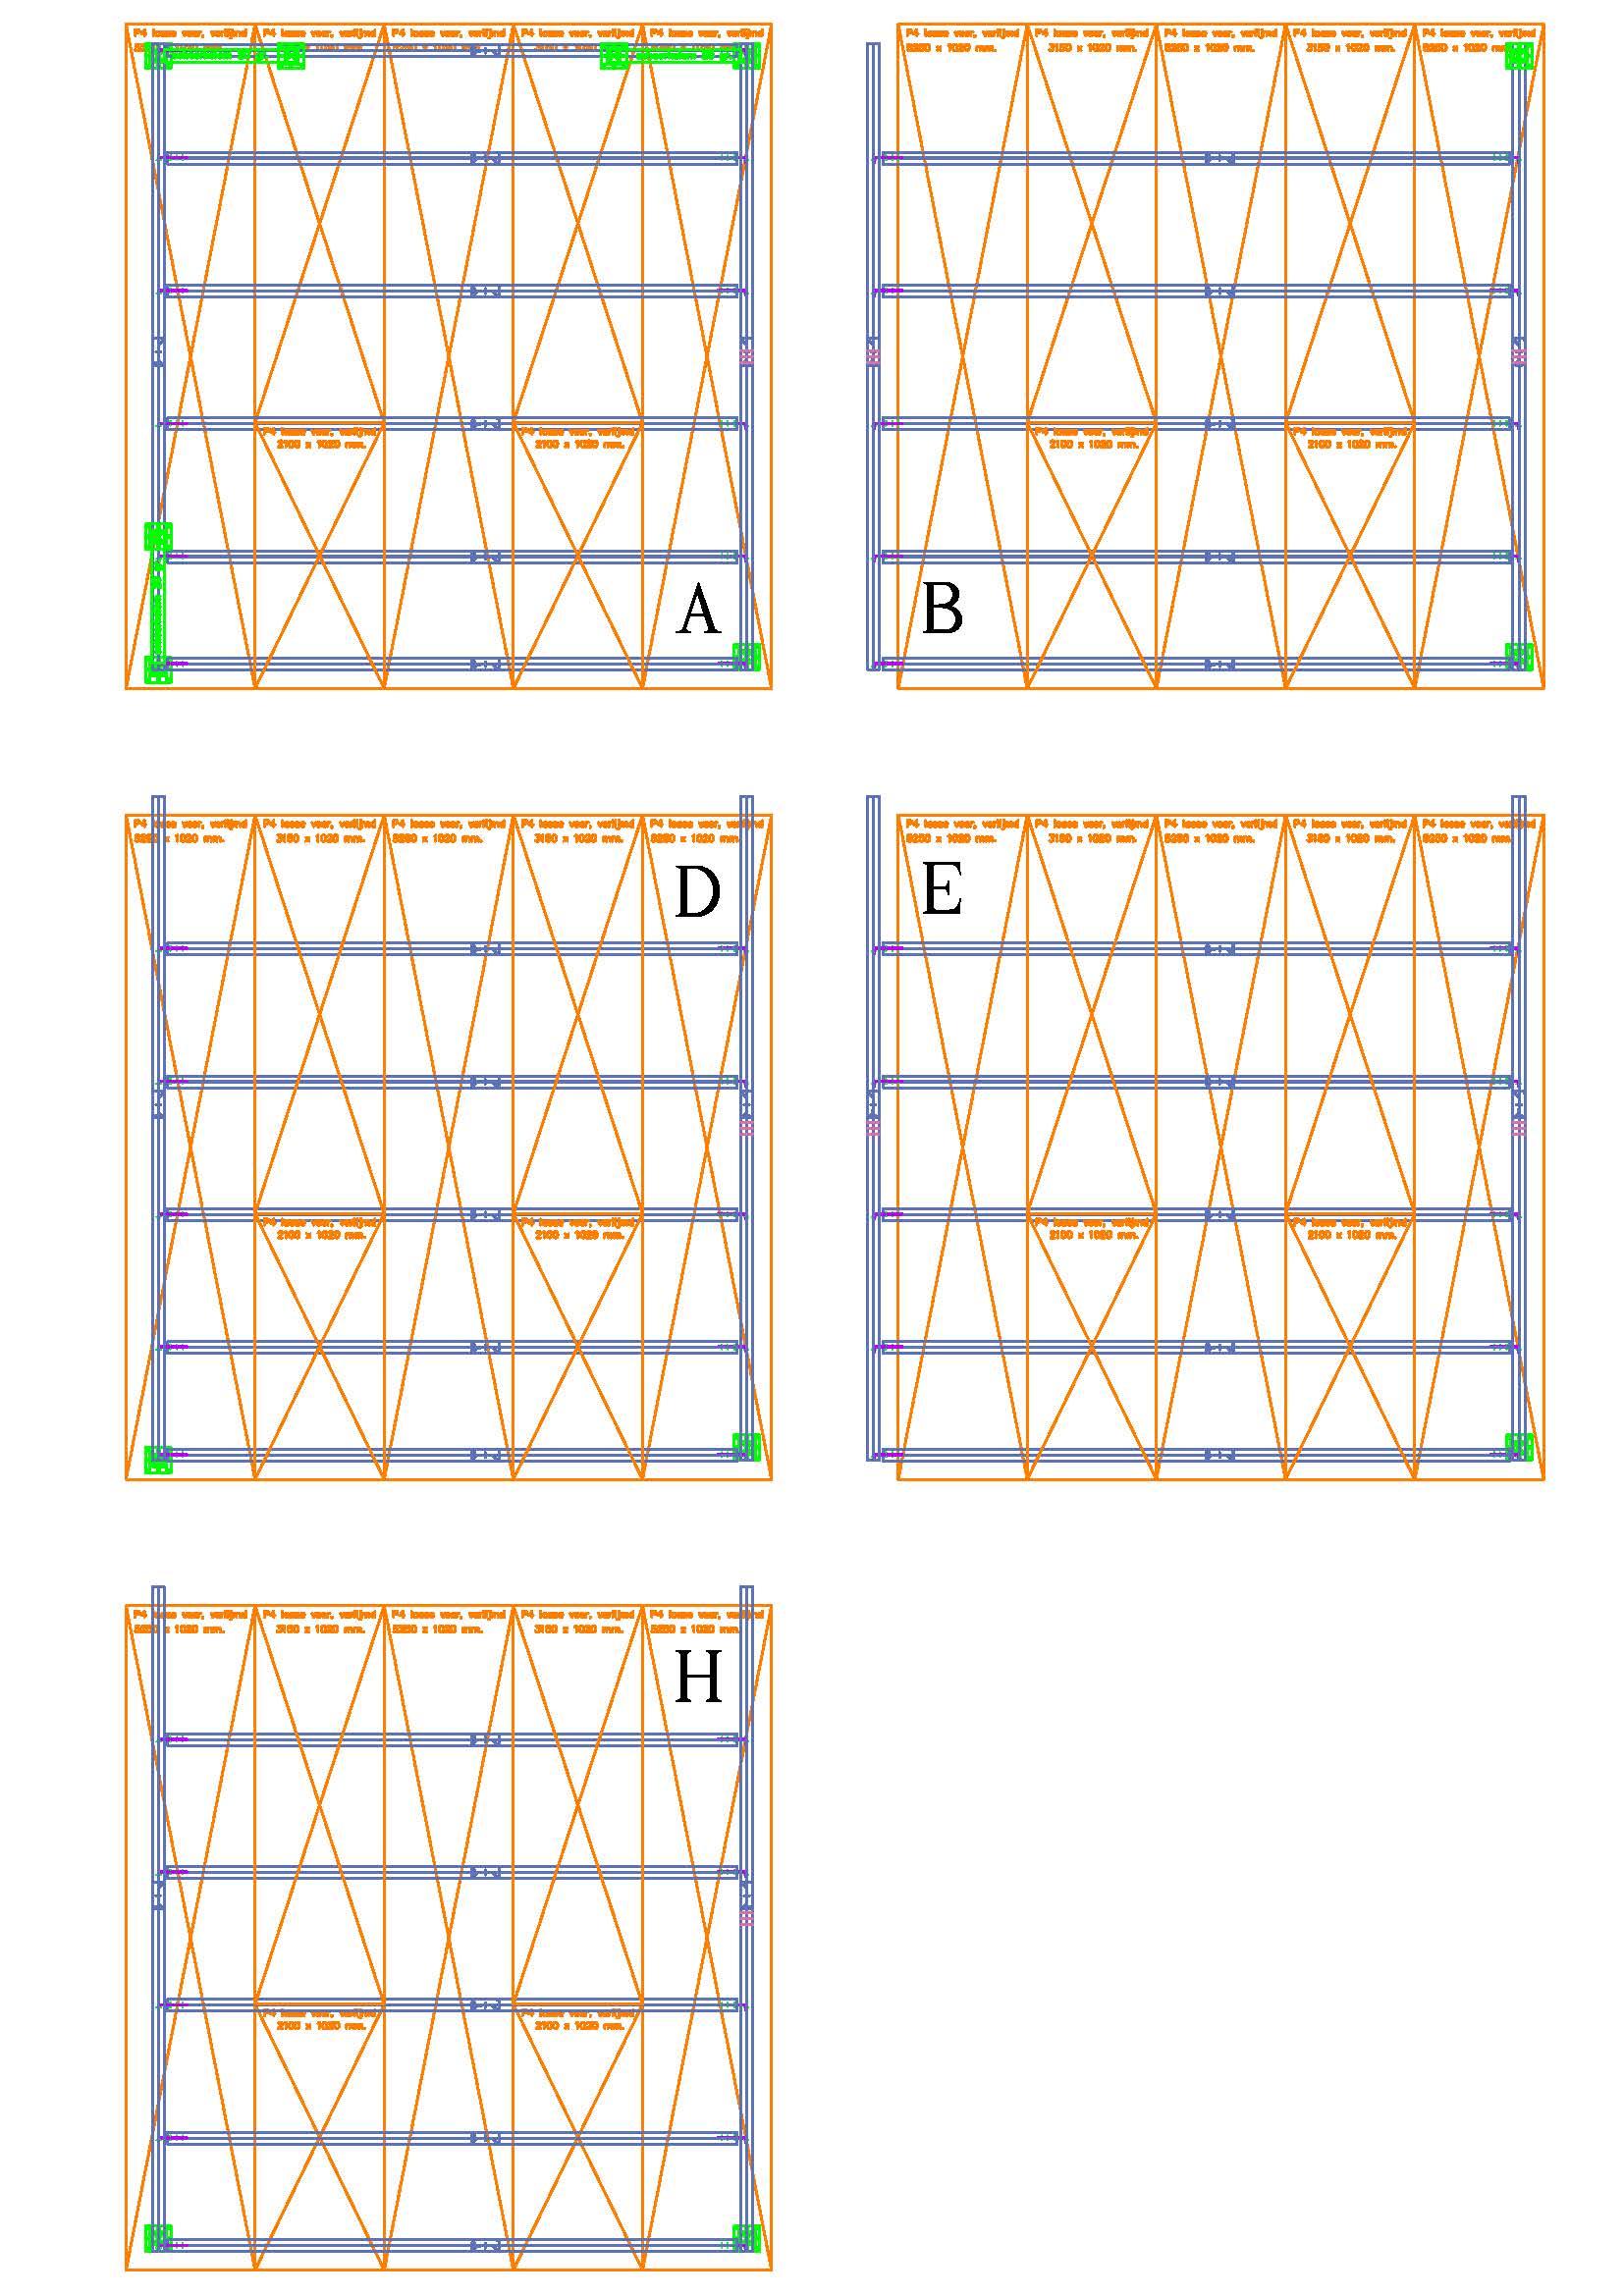 Rechthoekig-platform-mezzanine-etagevloer-etagevloer-bordes